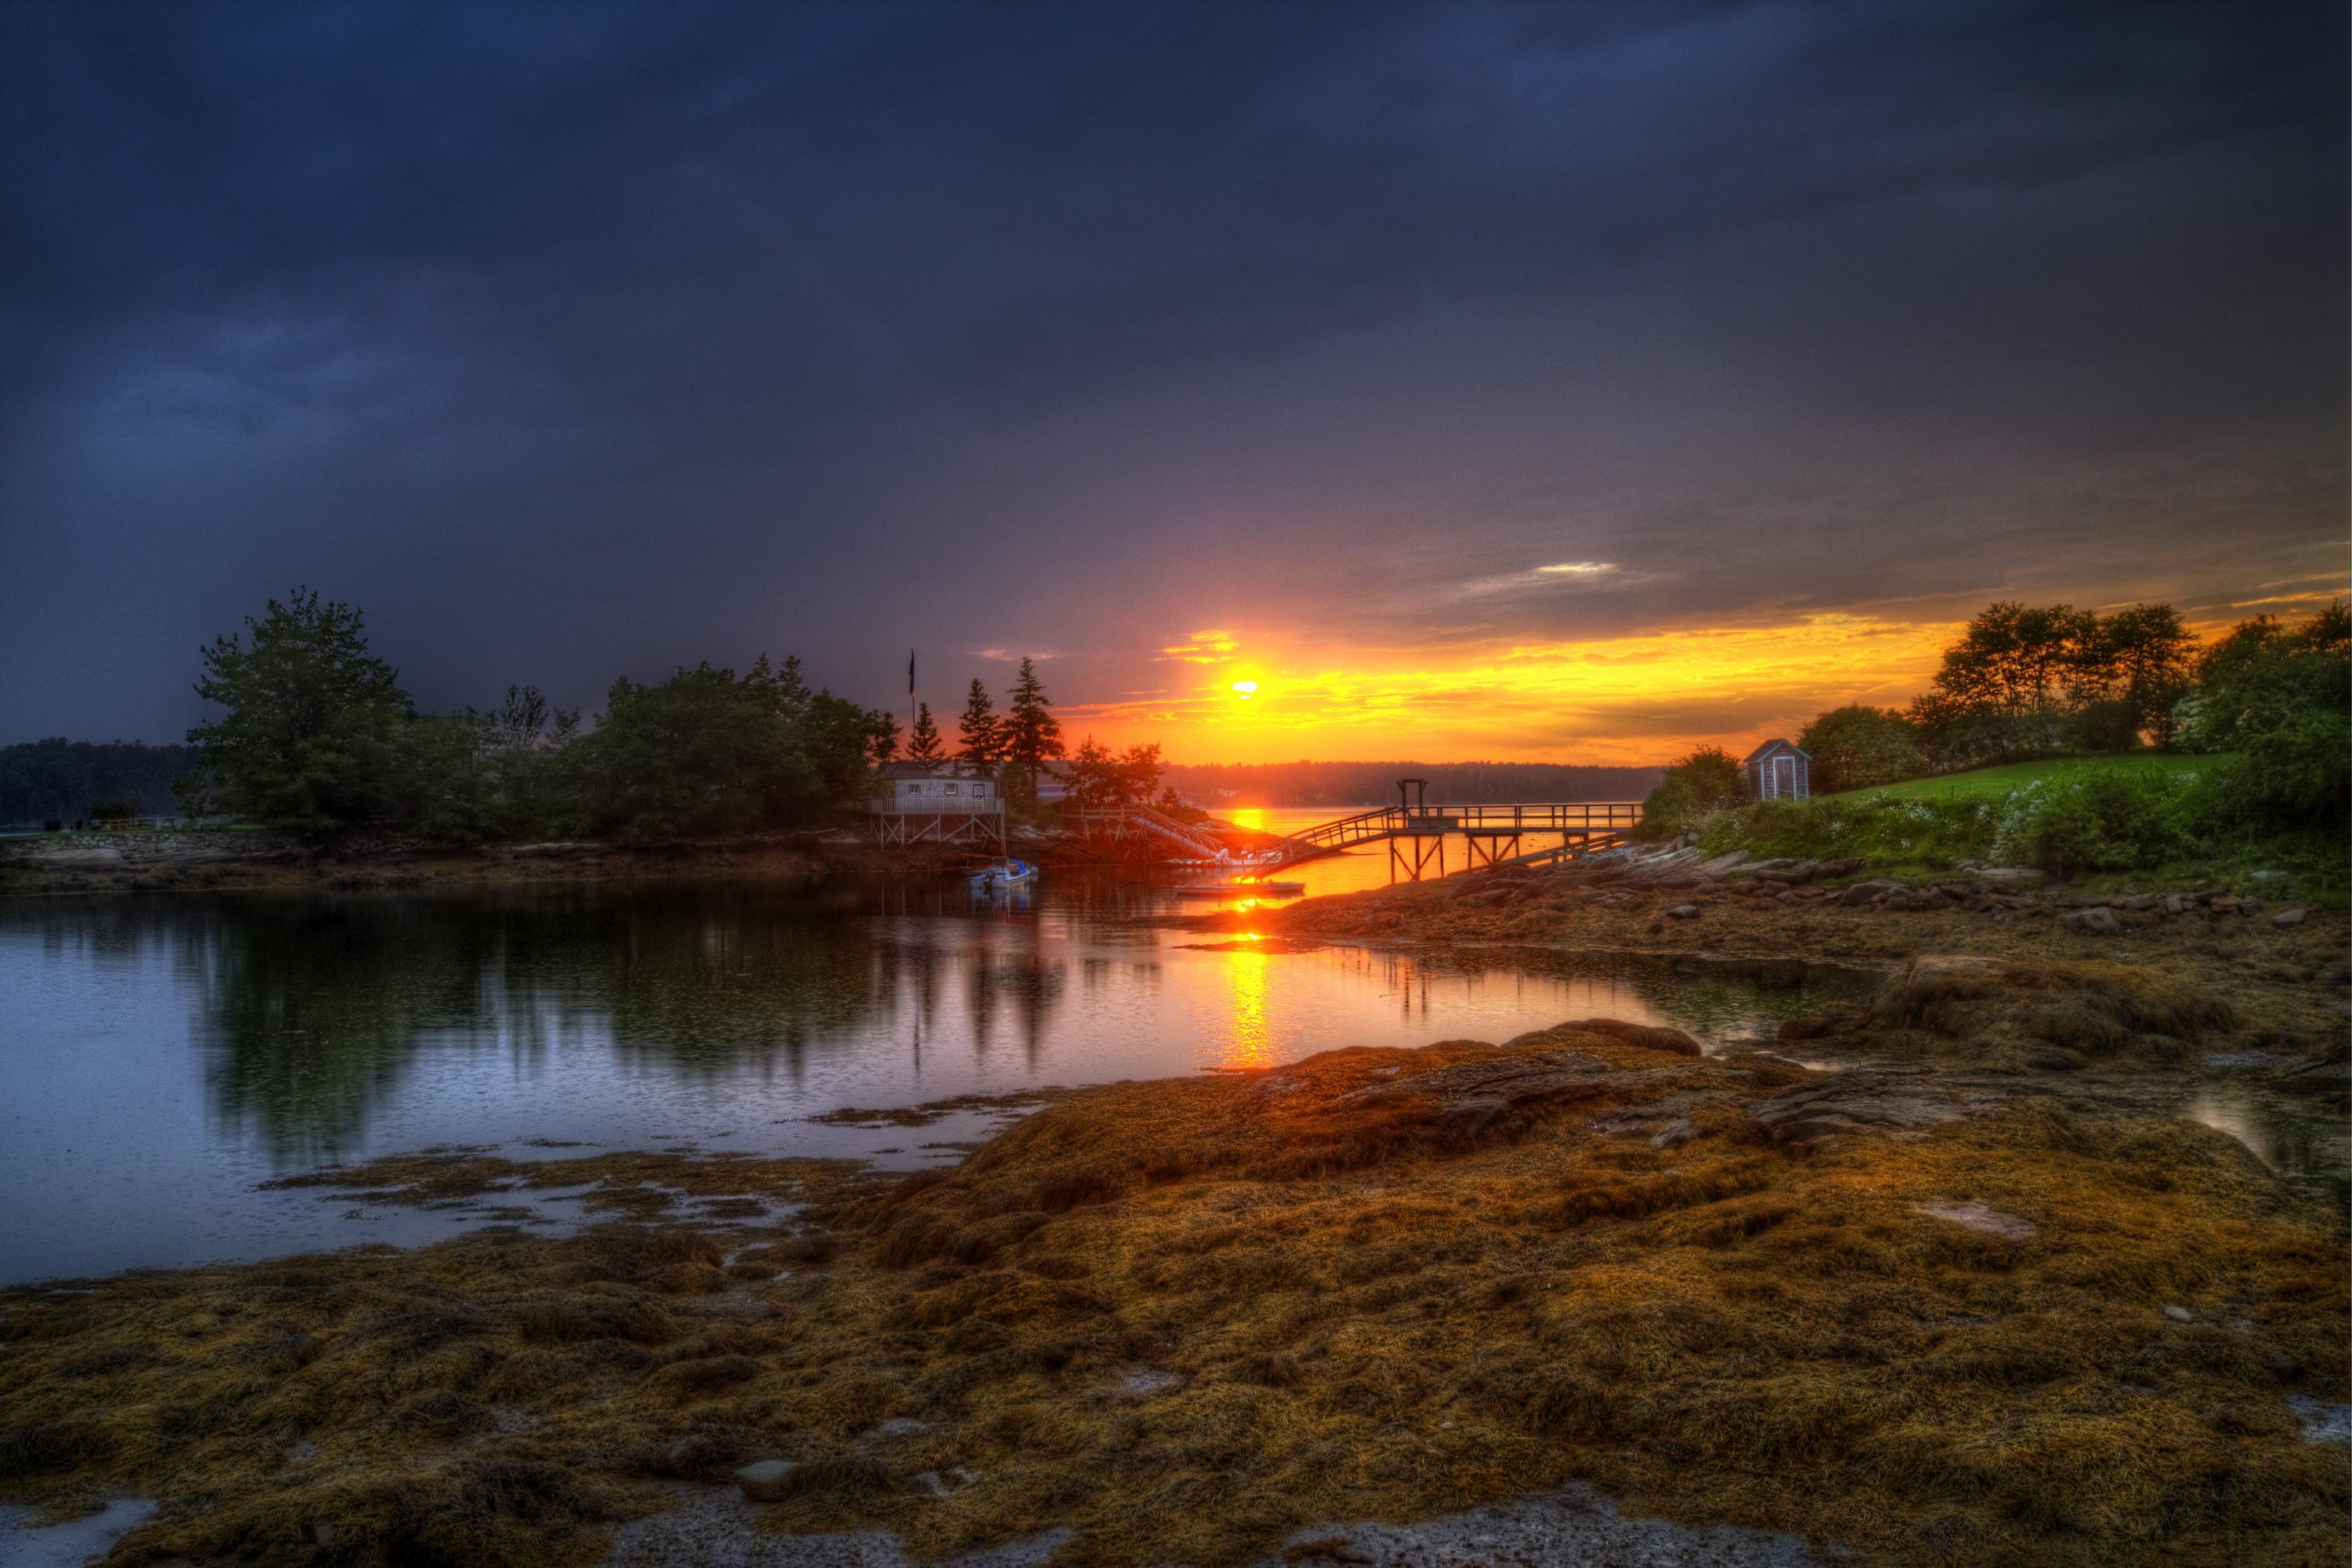 рассвет на озере бесплатно